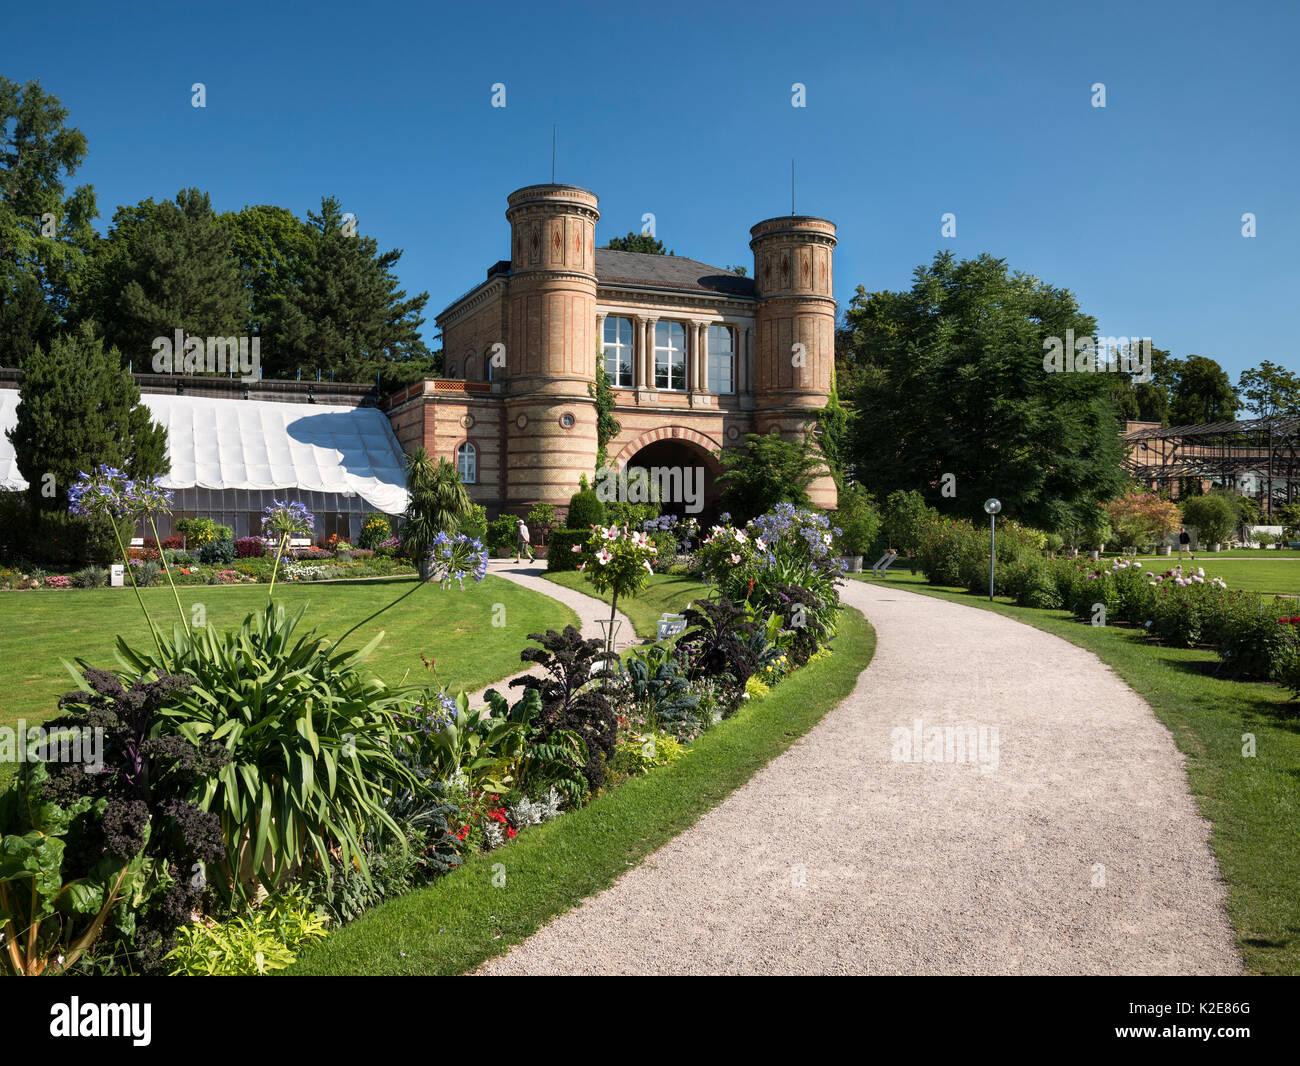 Arched building, botanical garden in the castle garden Karlsruhe, Karlsruhe, region Middle Oberrhein, Baden-Württemberg Stock Photo